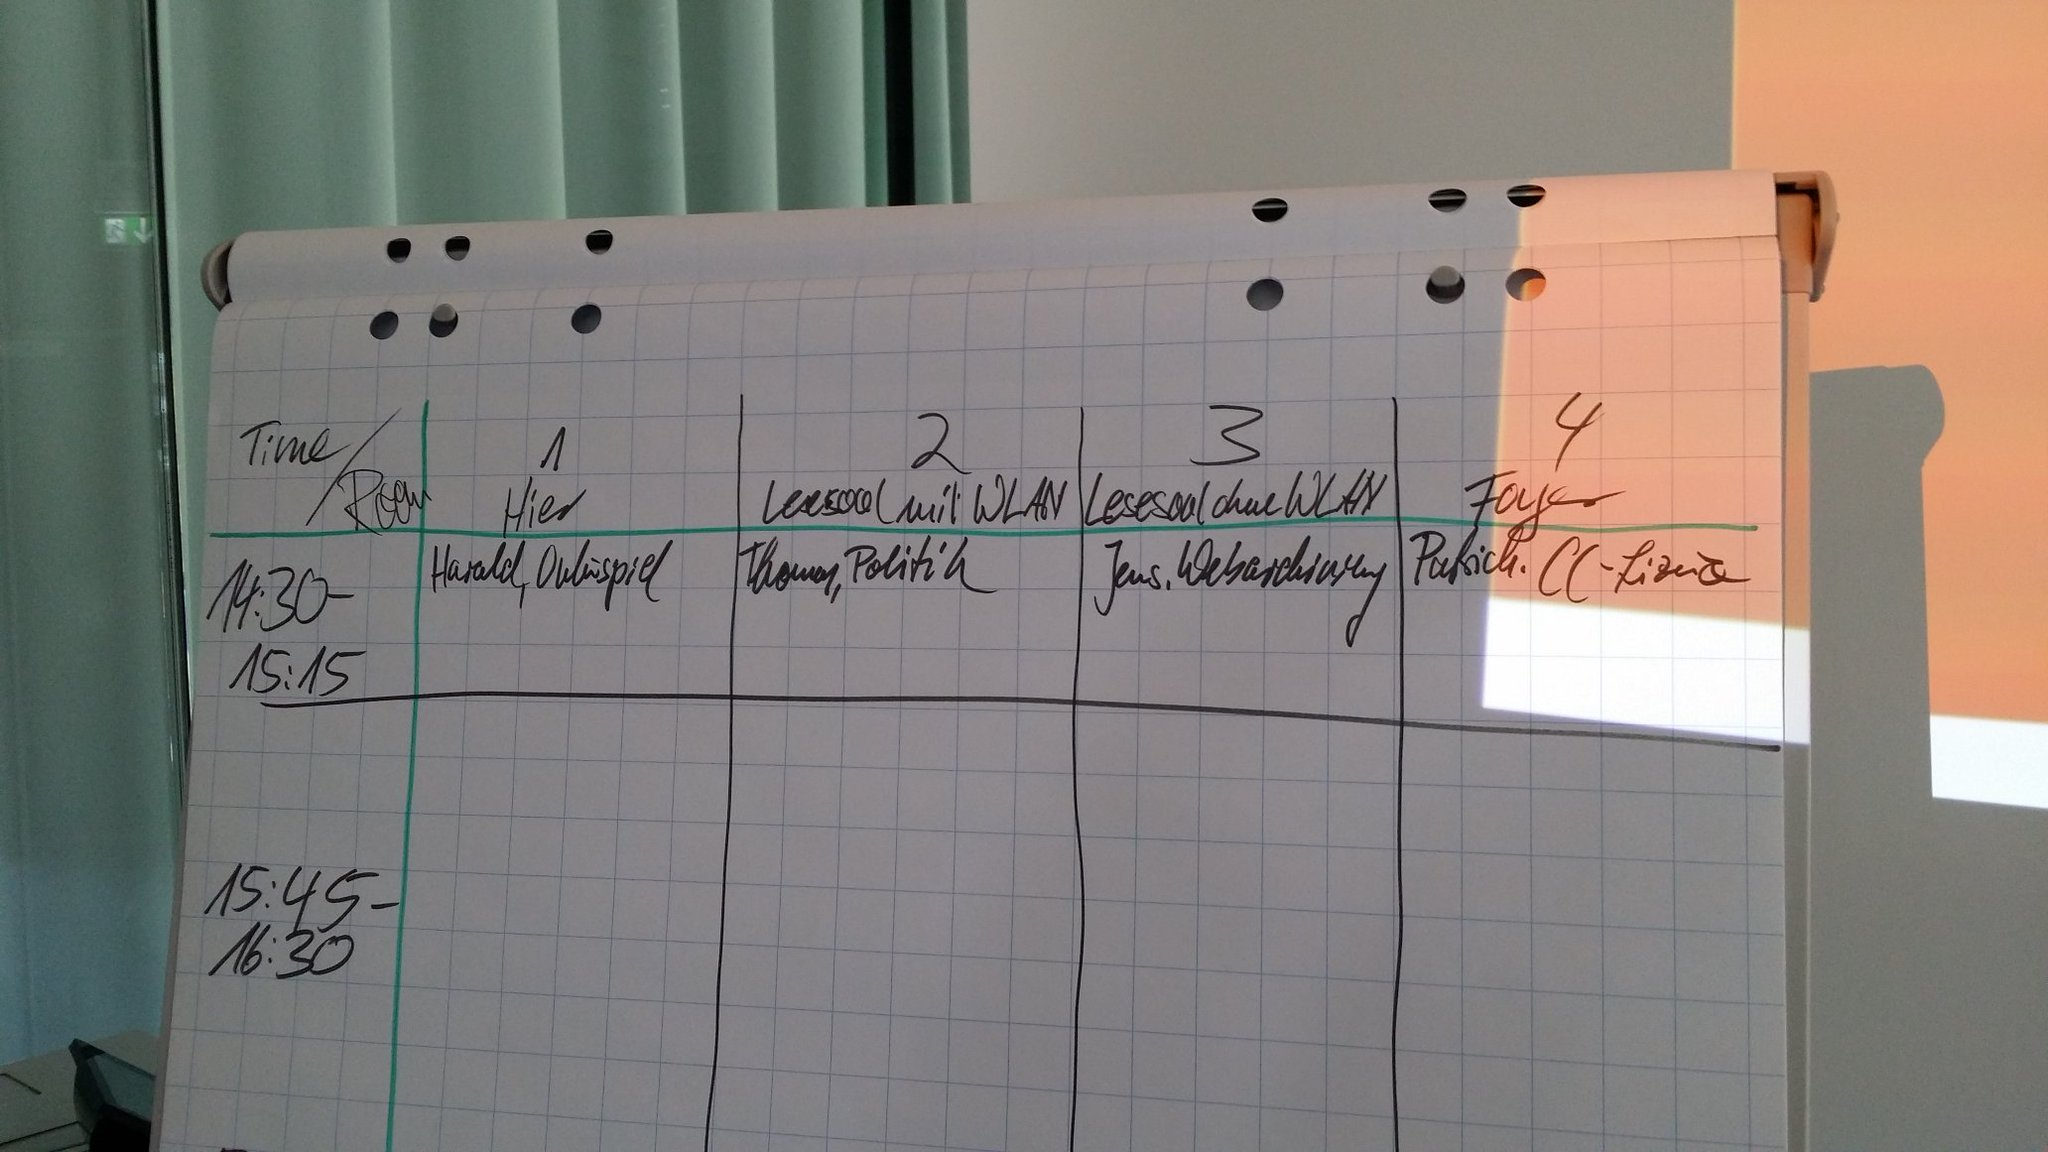 #Archivcamp Zeittafel. https://t.co/tYdUQrmHJu